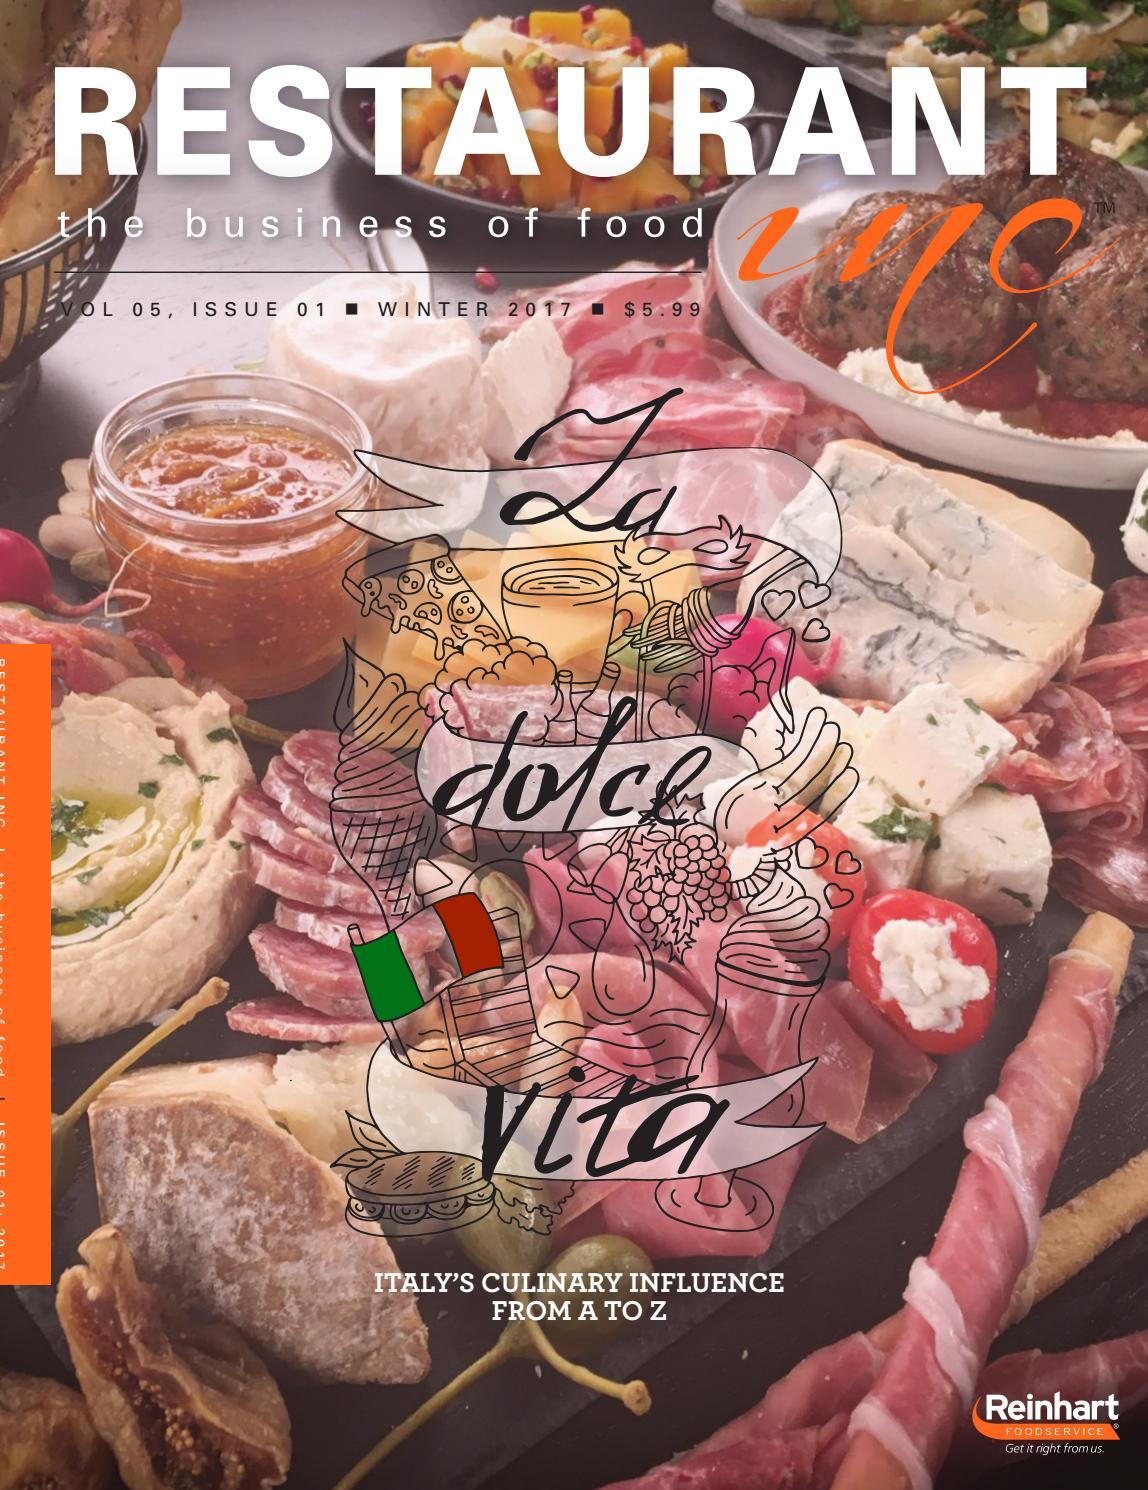 Capellini Al Forno Giada restaurant inc. winter 2017reinhart_publications - issuu